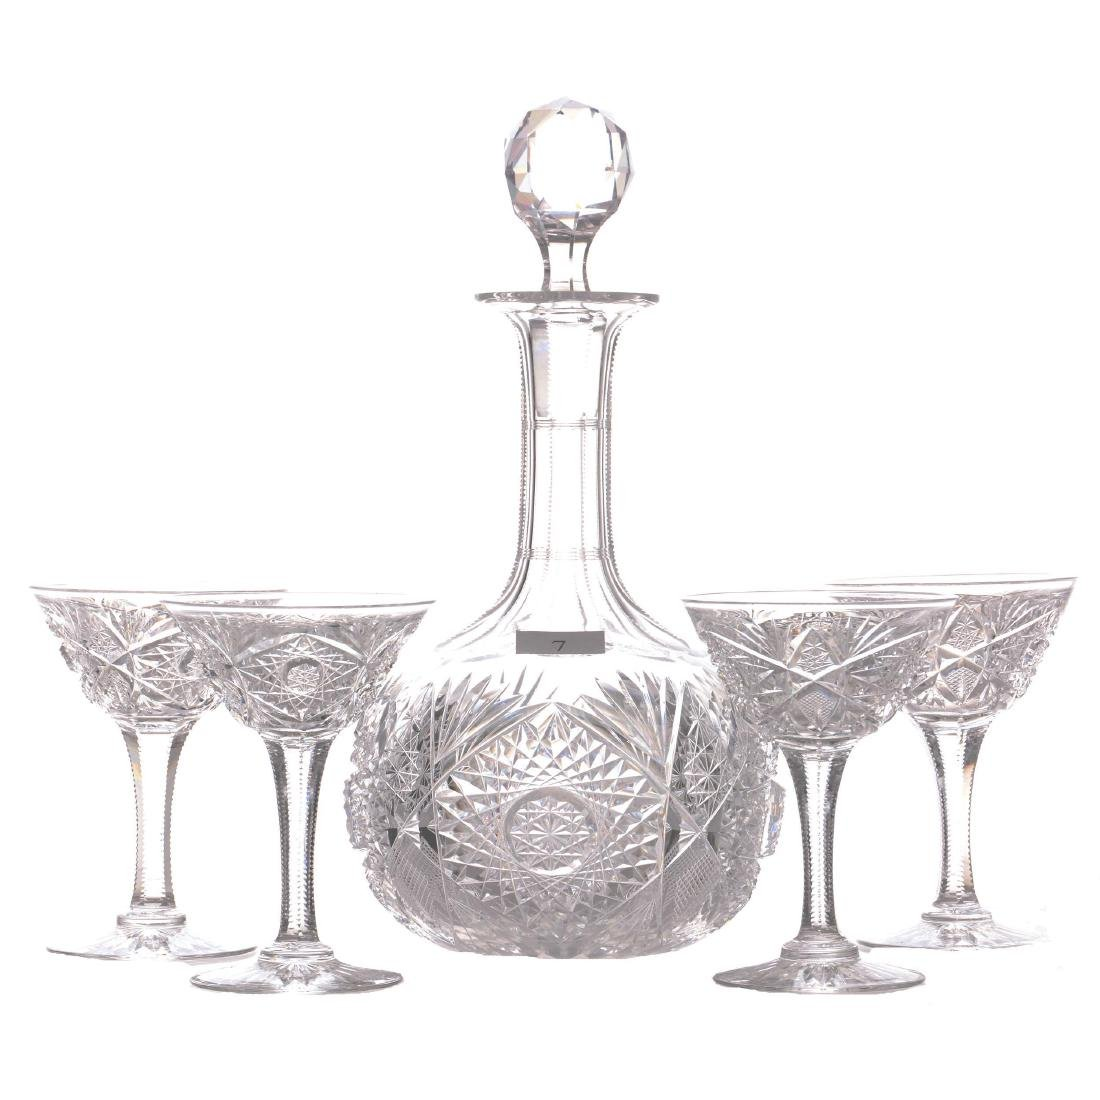 "Liquor Set - 9.75"" Decanter - ABCG - Monarch Pattern by"